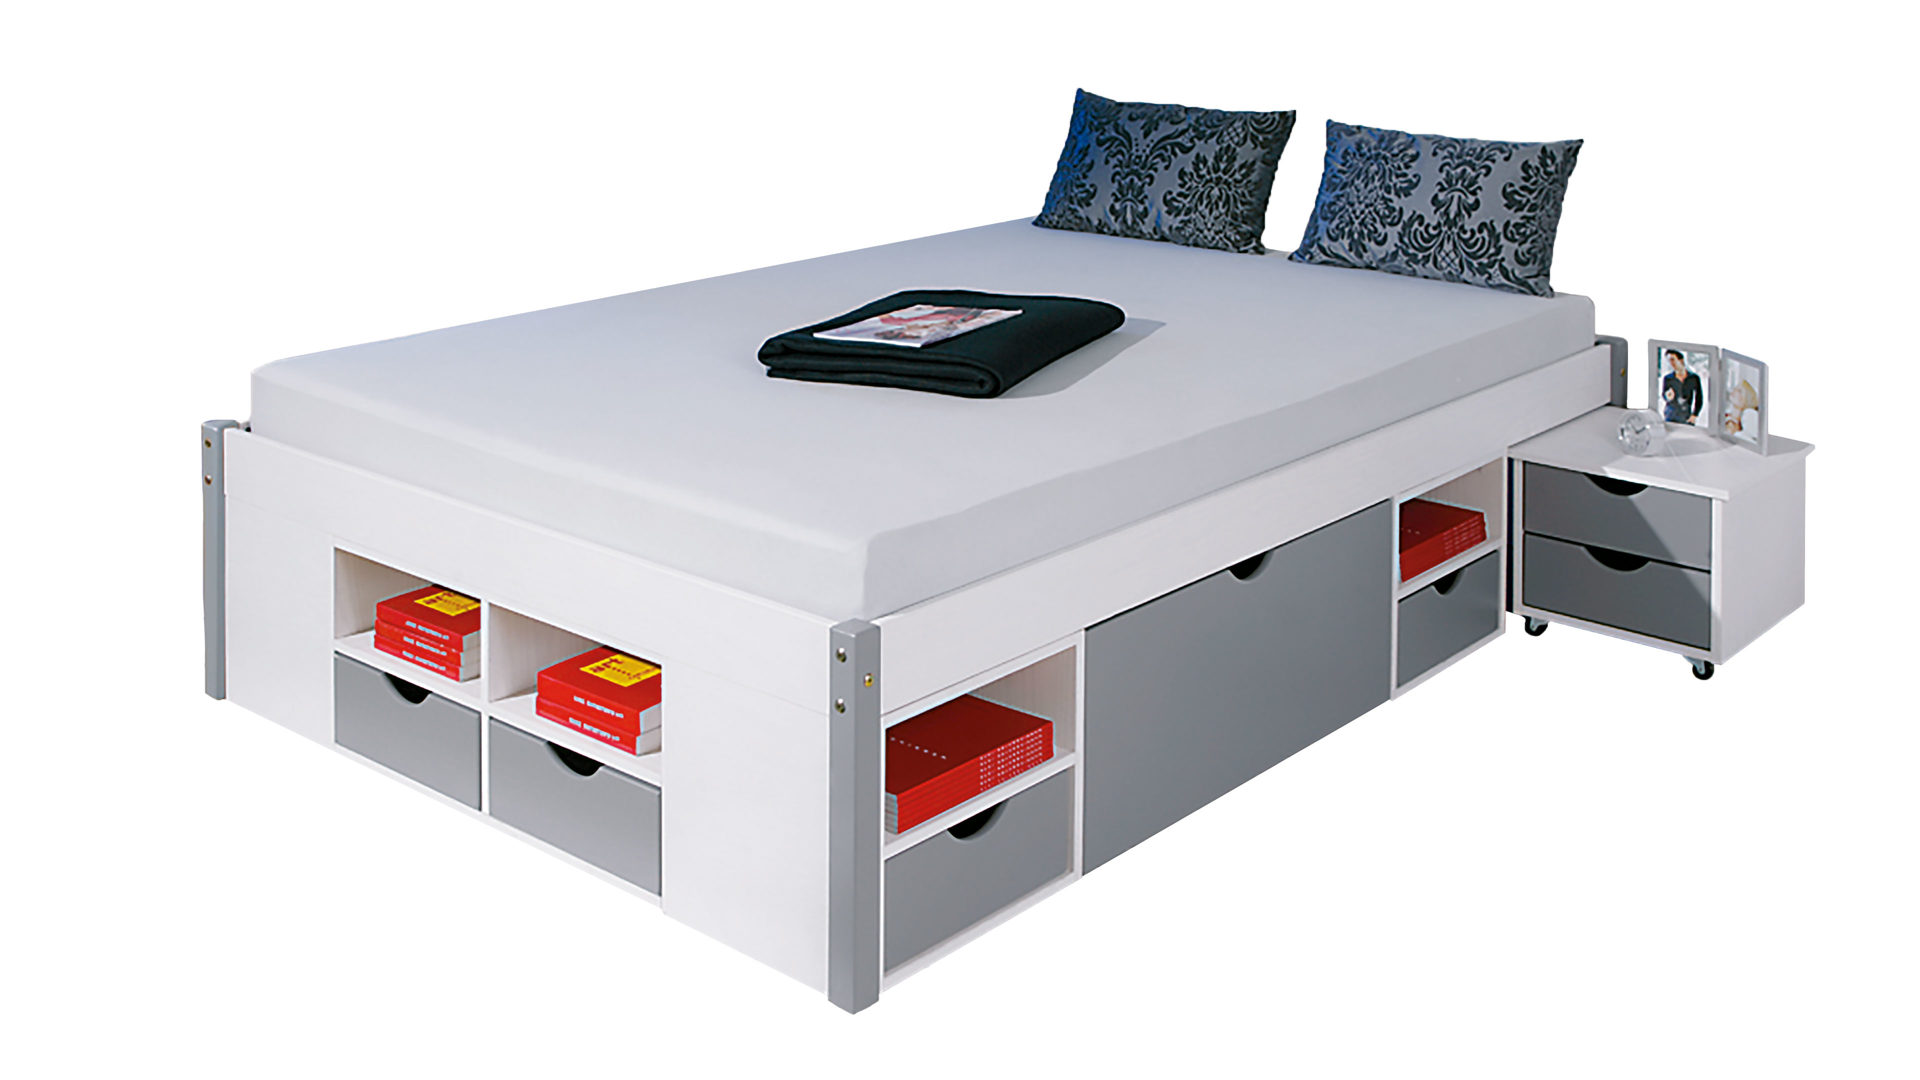 Schubkastenbettgestell Mikar Ein Funktionsbett Inklusive Lattenrost